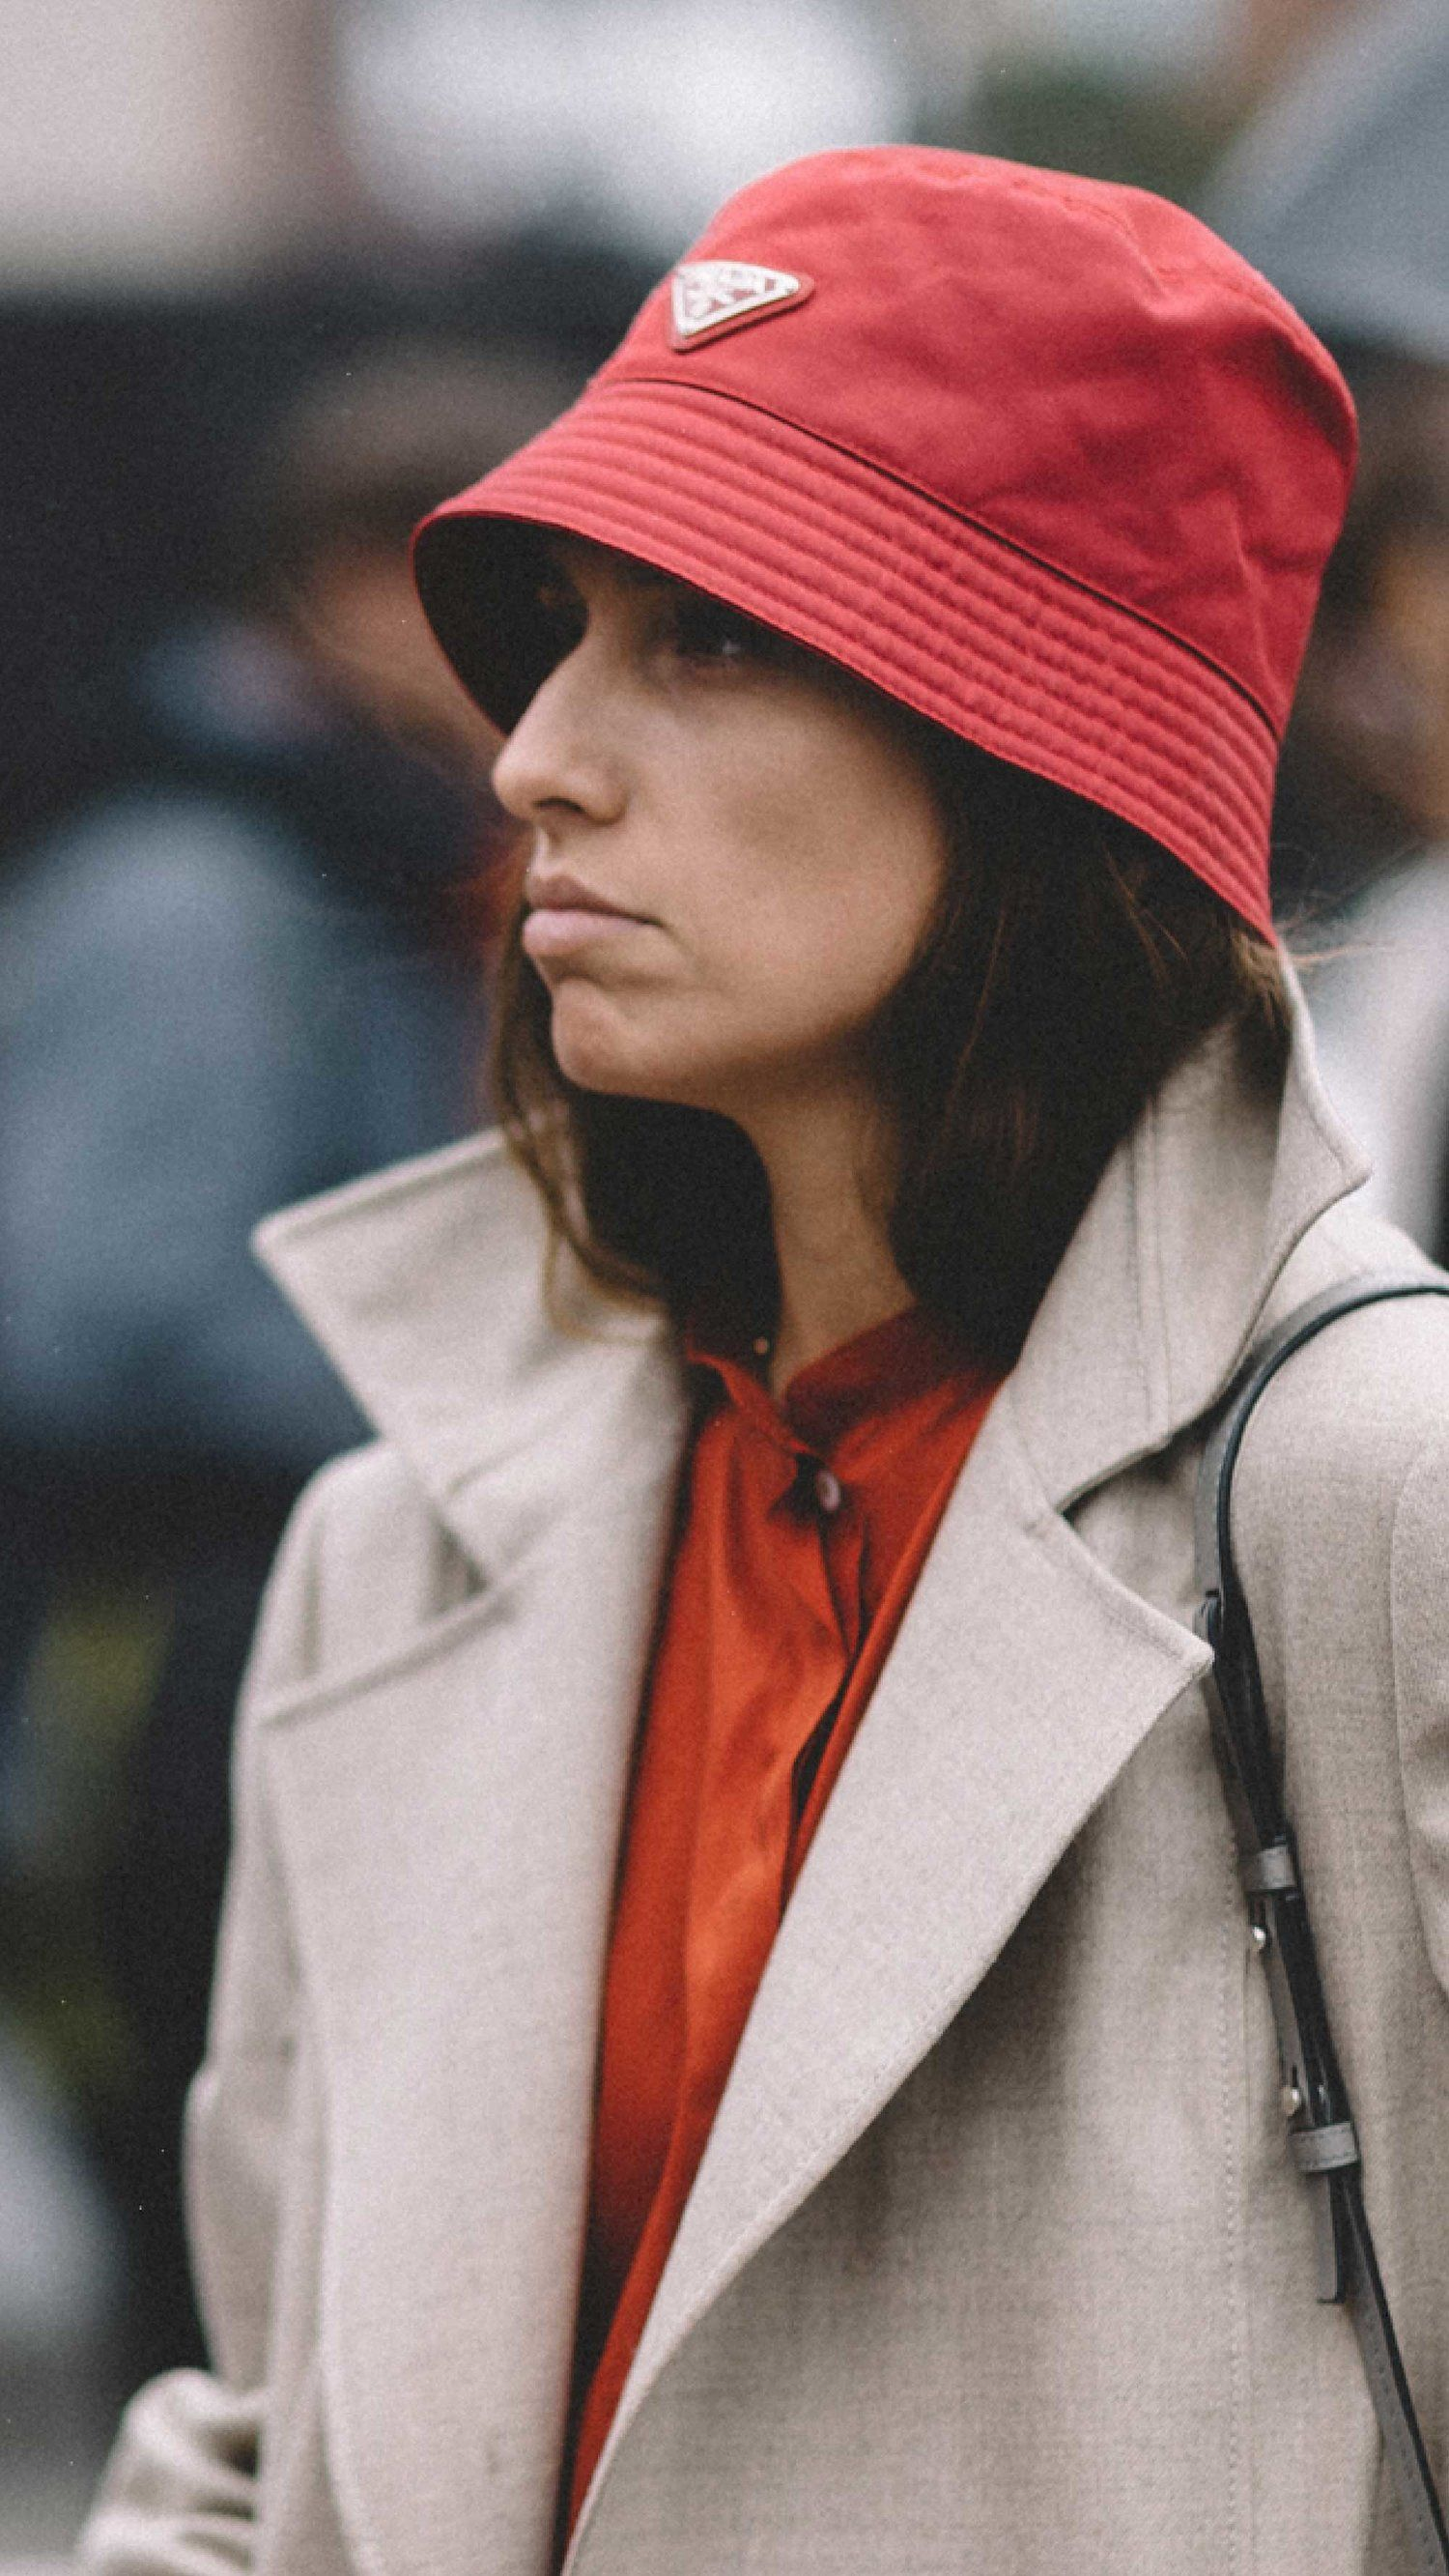 2c588c59b68 New York Fashion Week Spring Summer 2018 street style outfit Prada bucket  hat